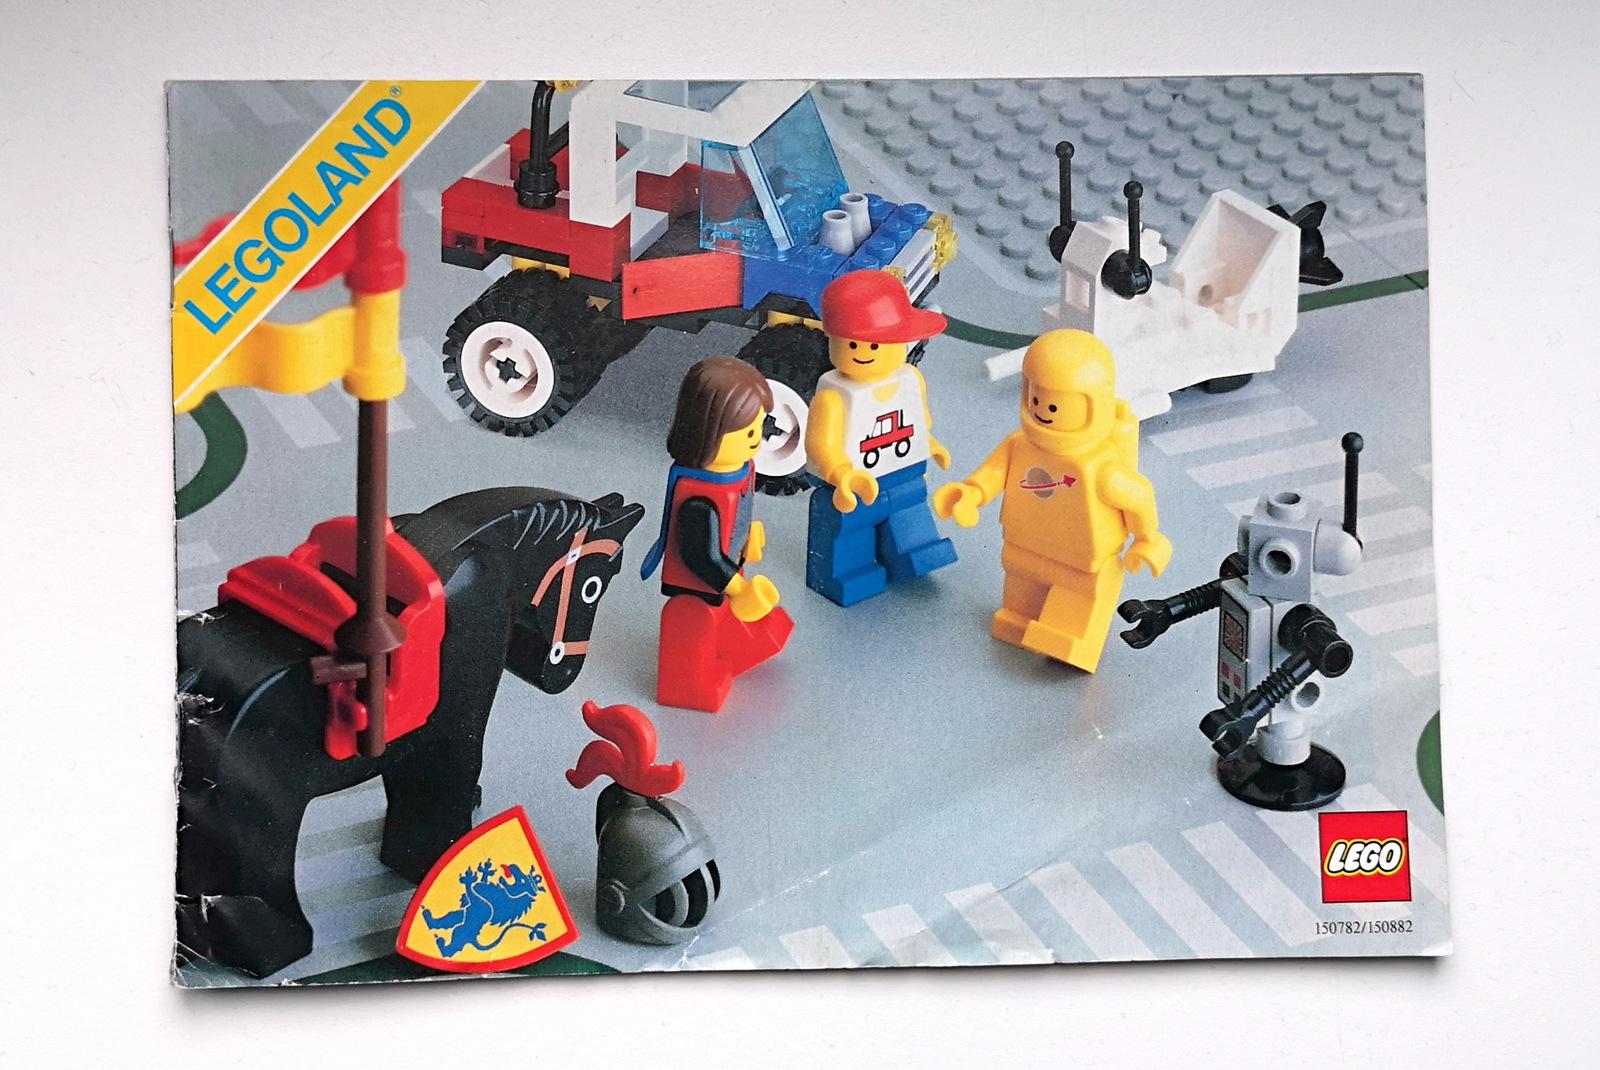 LEGO Katalog 1987